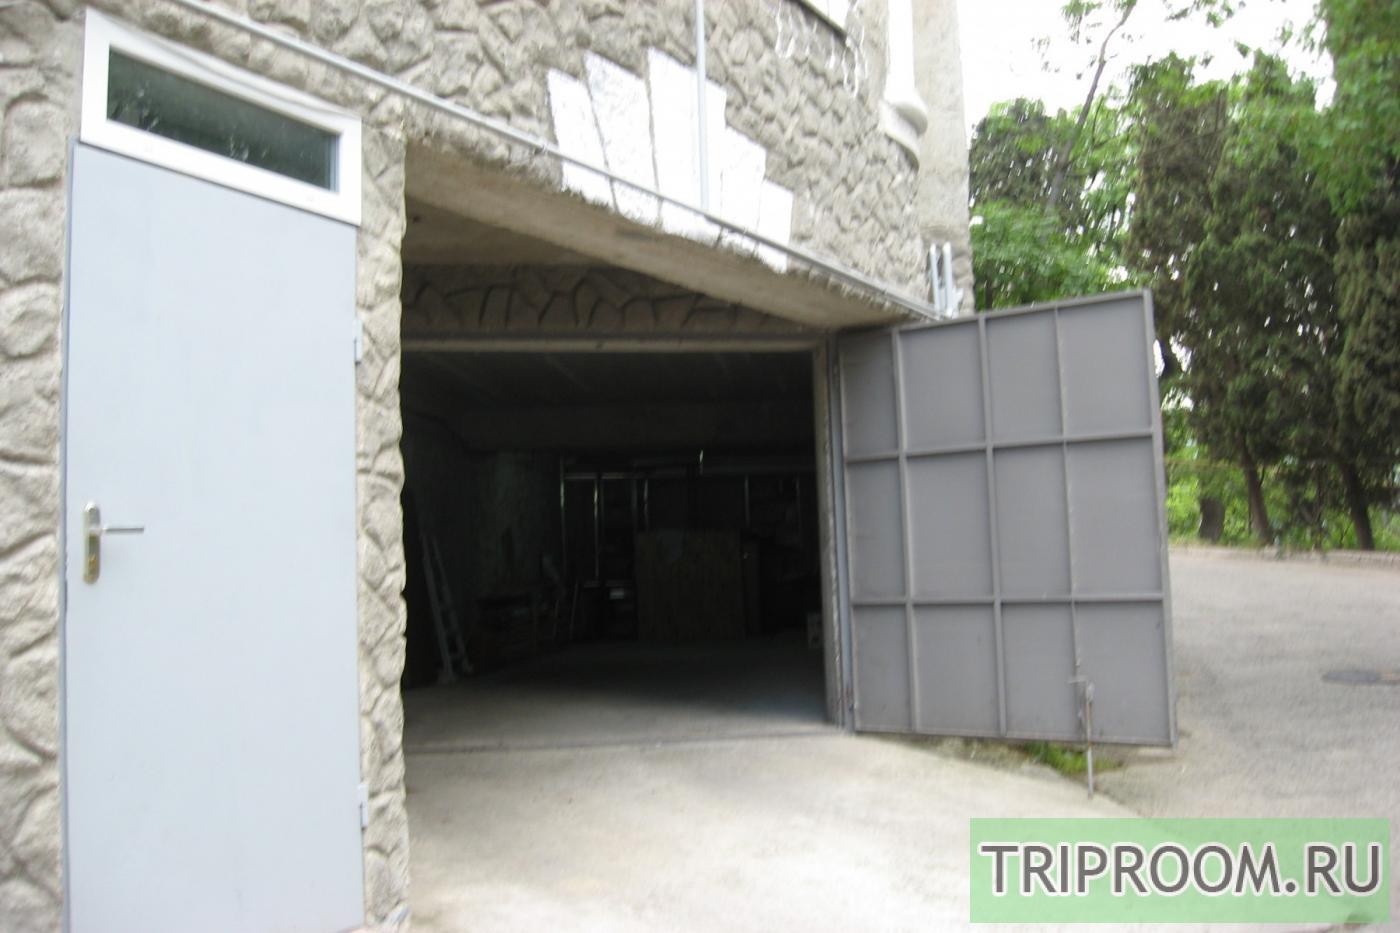 2-комнатная квартира посуточно (вариант № 20368), ул. Свердлова переулок, фото № 14